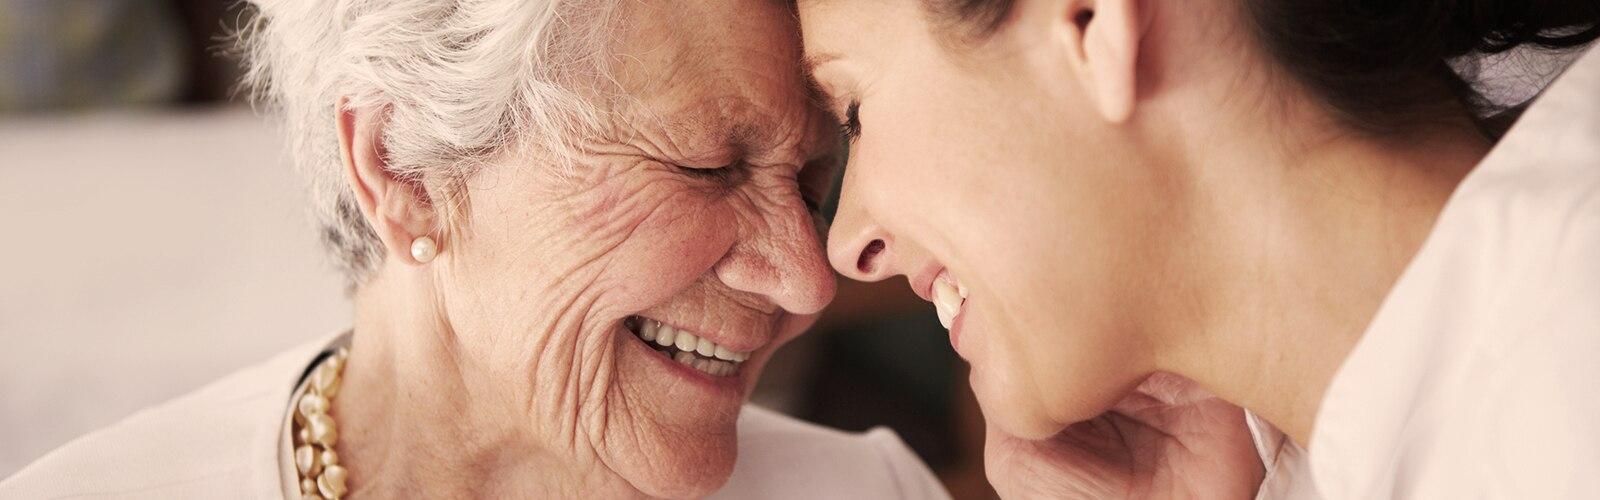 Nasmijane starija gospođa i mlađa žena – kako demencija utječe na vaše najmilije